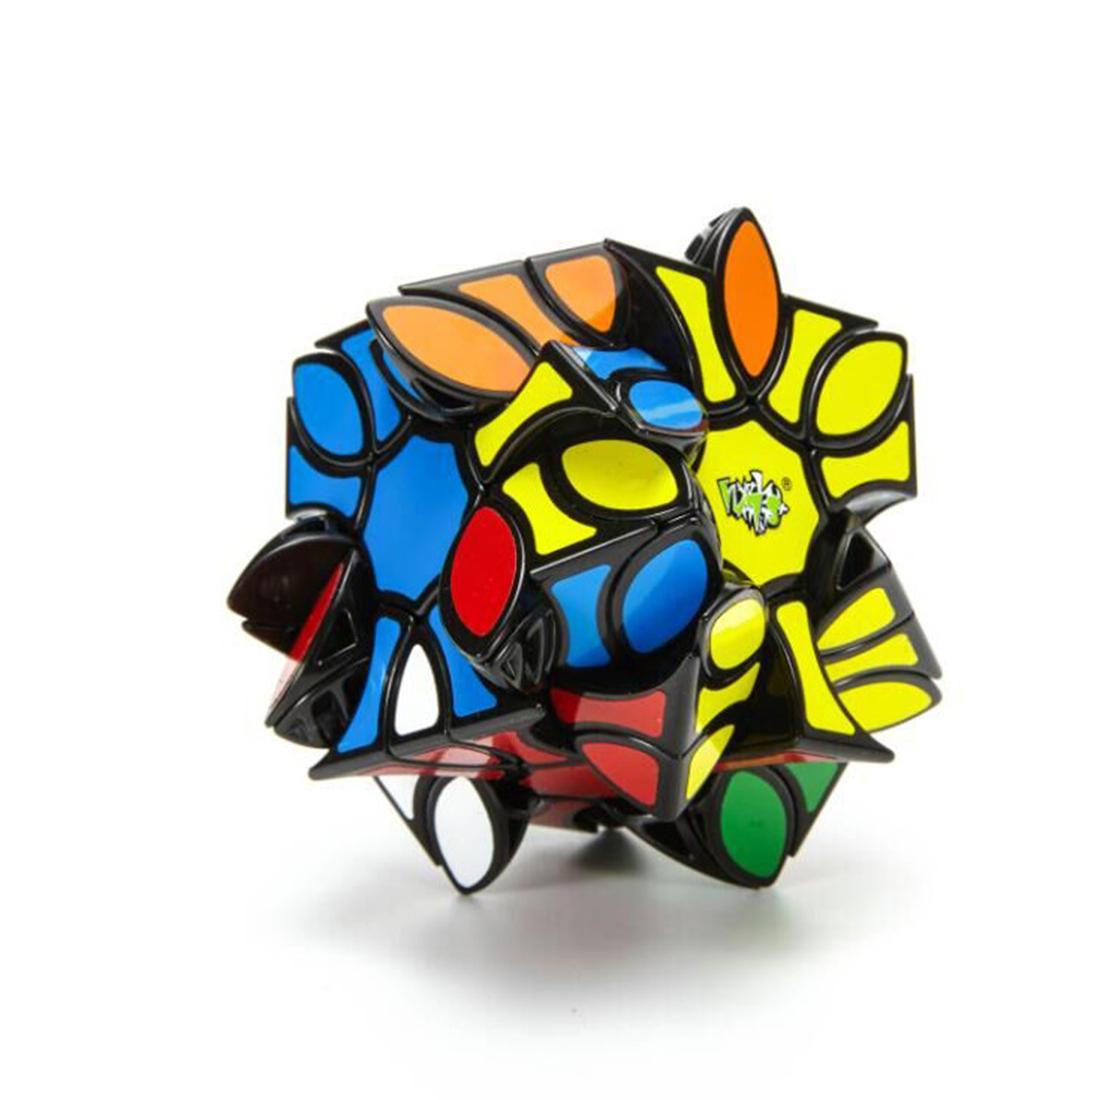 Lanlan Sunflower Cube 1